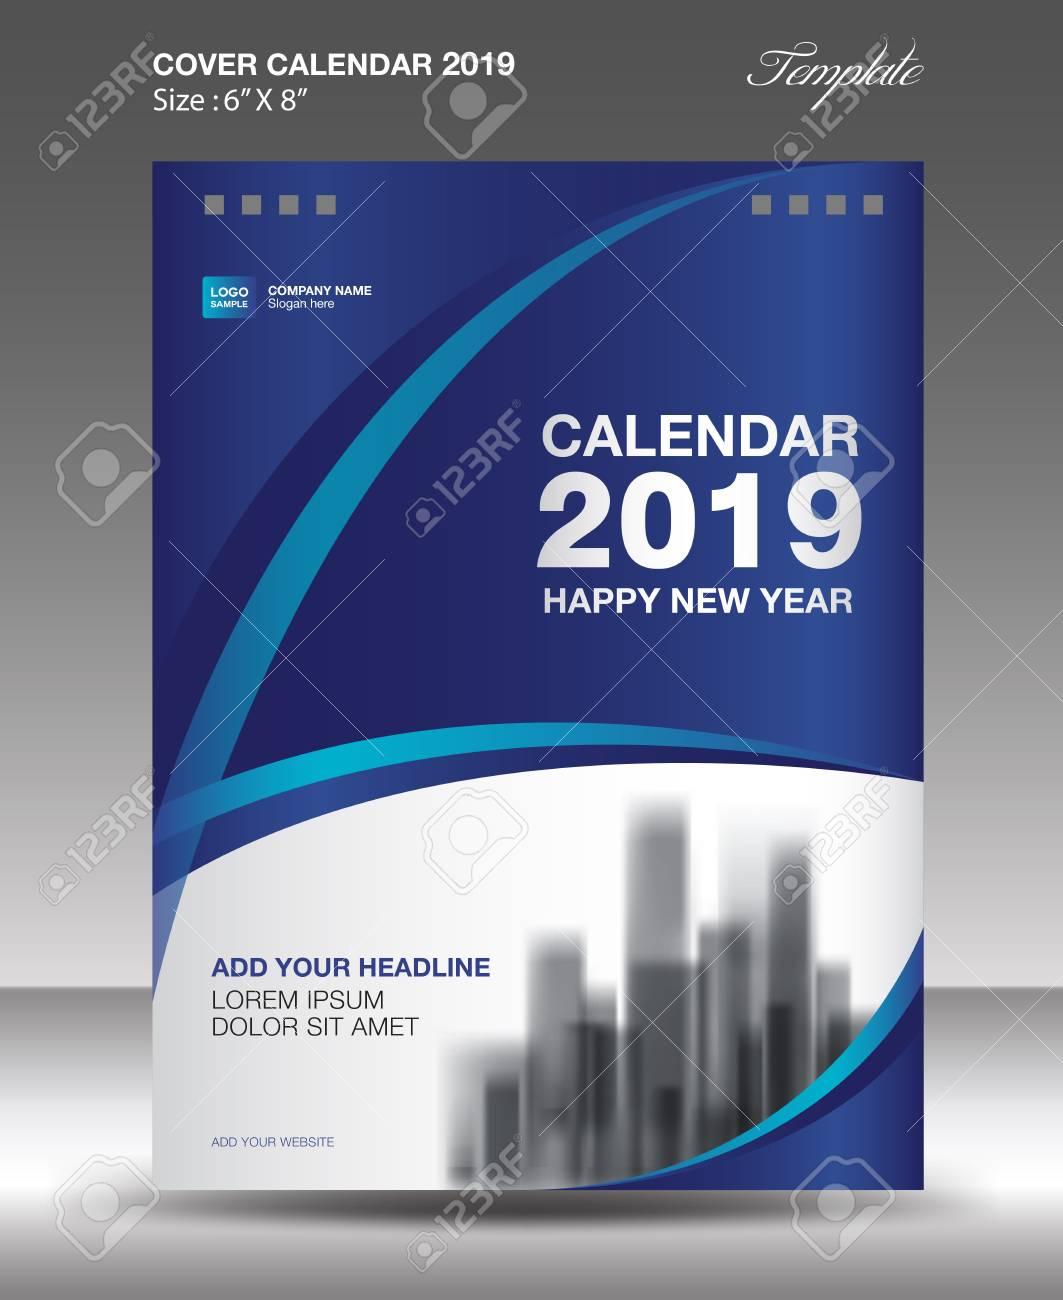 Calendar Flyer Template | Blue Cover Desk Calendar 2019 Design Flyer Template Ads Booklet